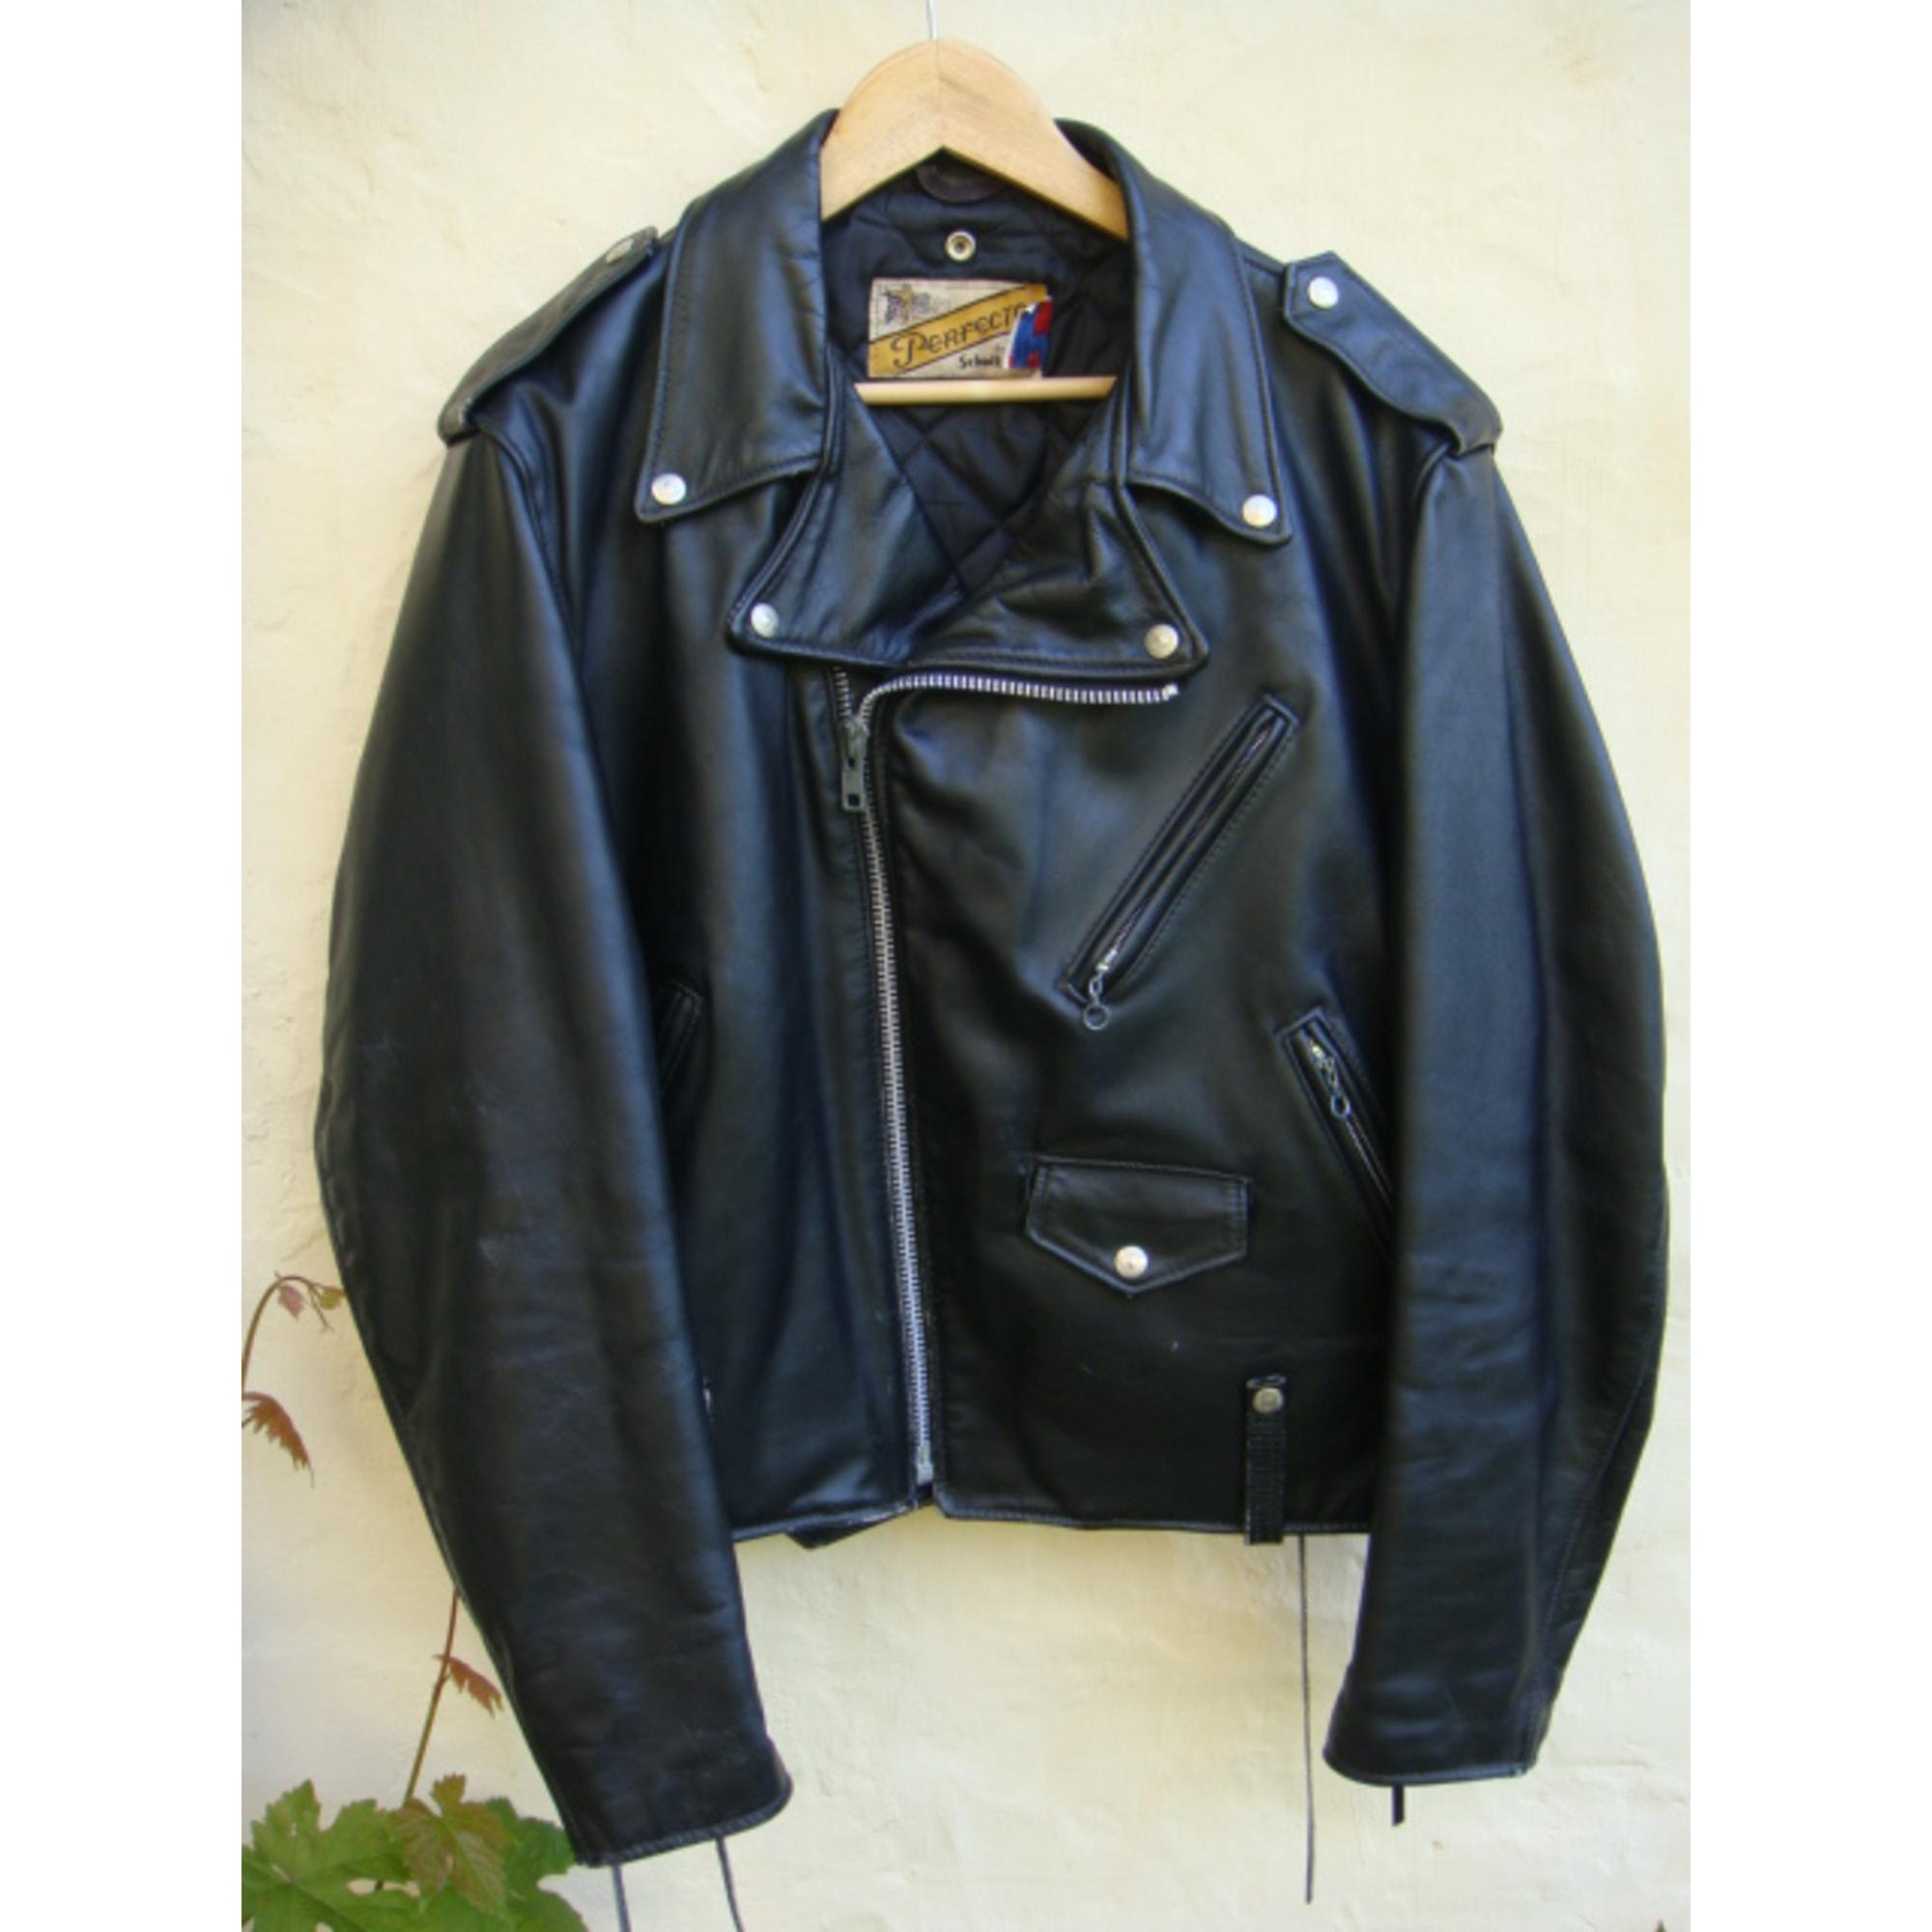 Blouson en cuir SCHOTT 54 (L) noir - 1443142 0cc38858a79